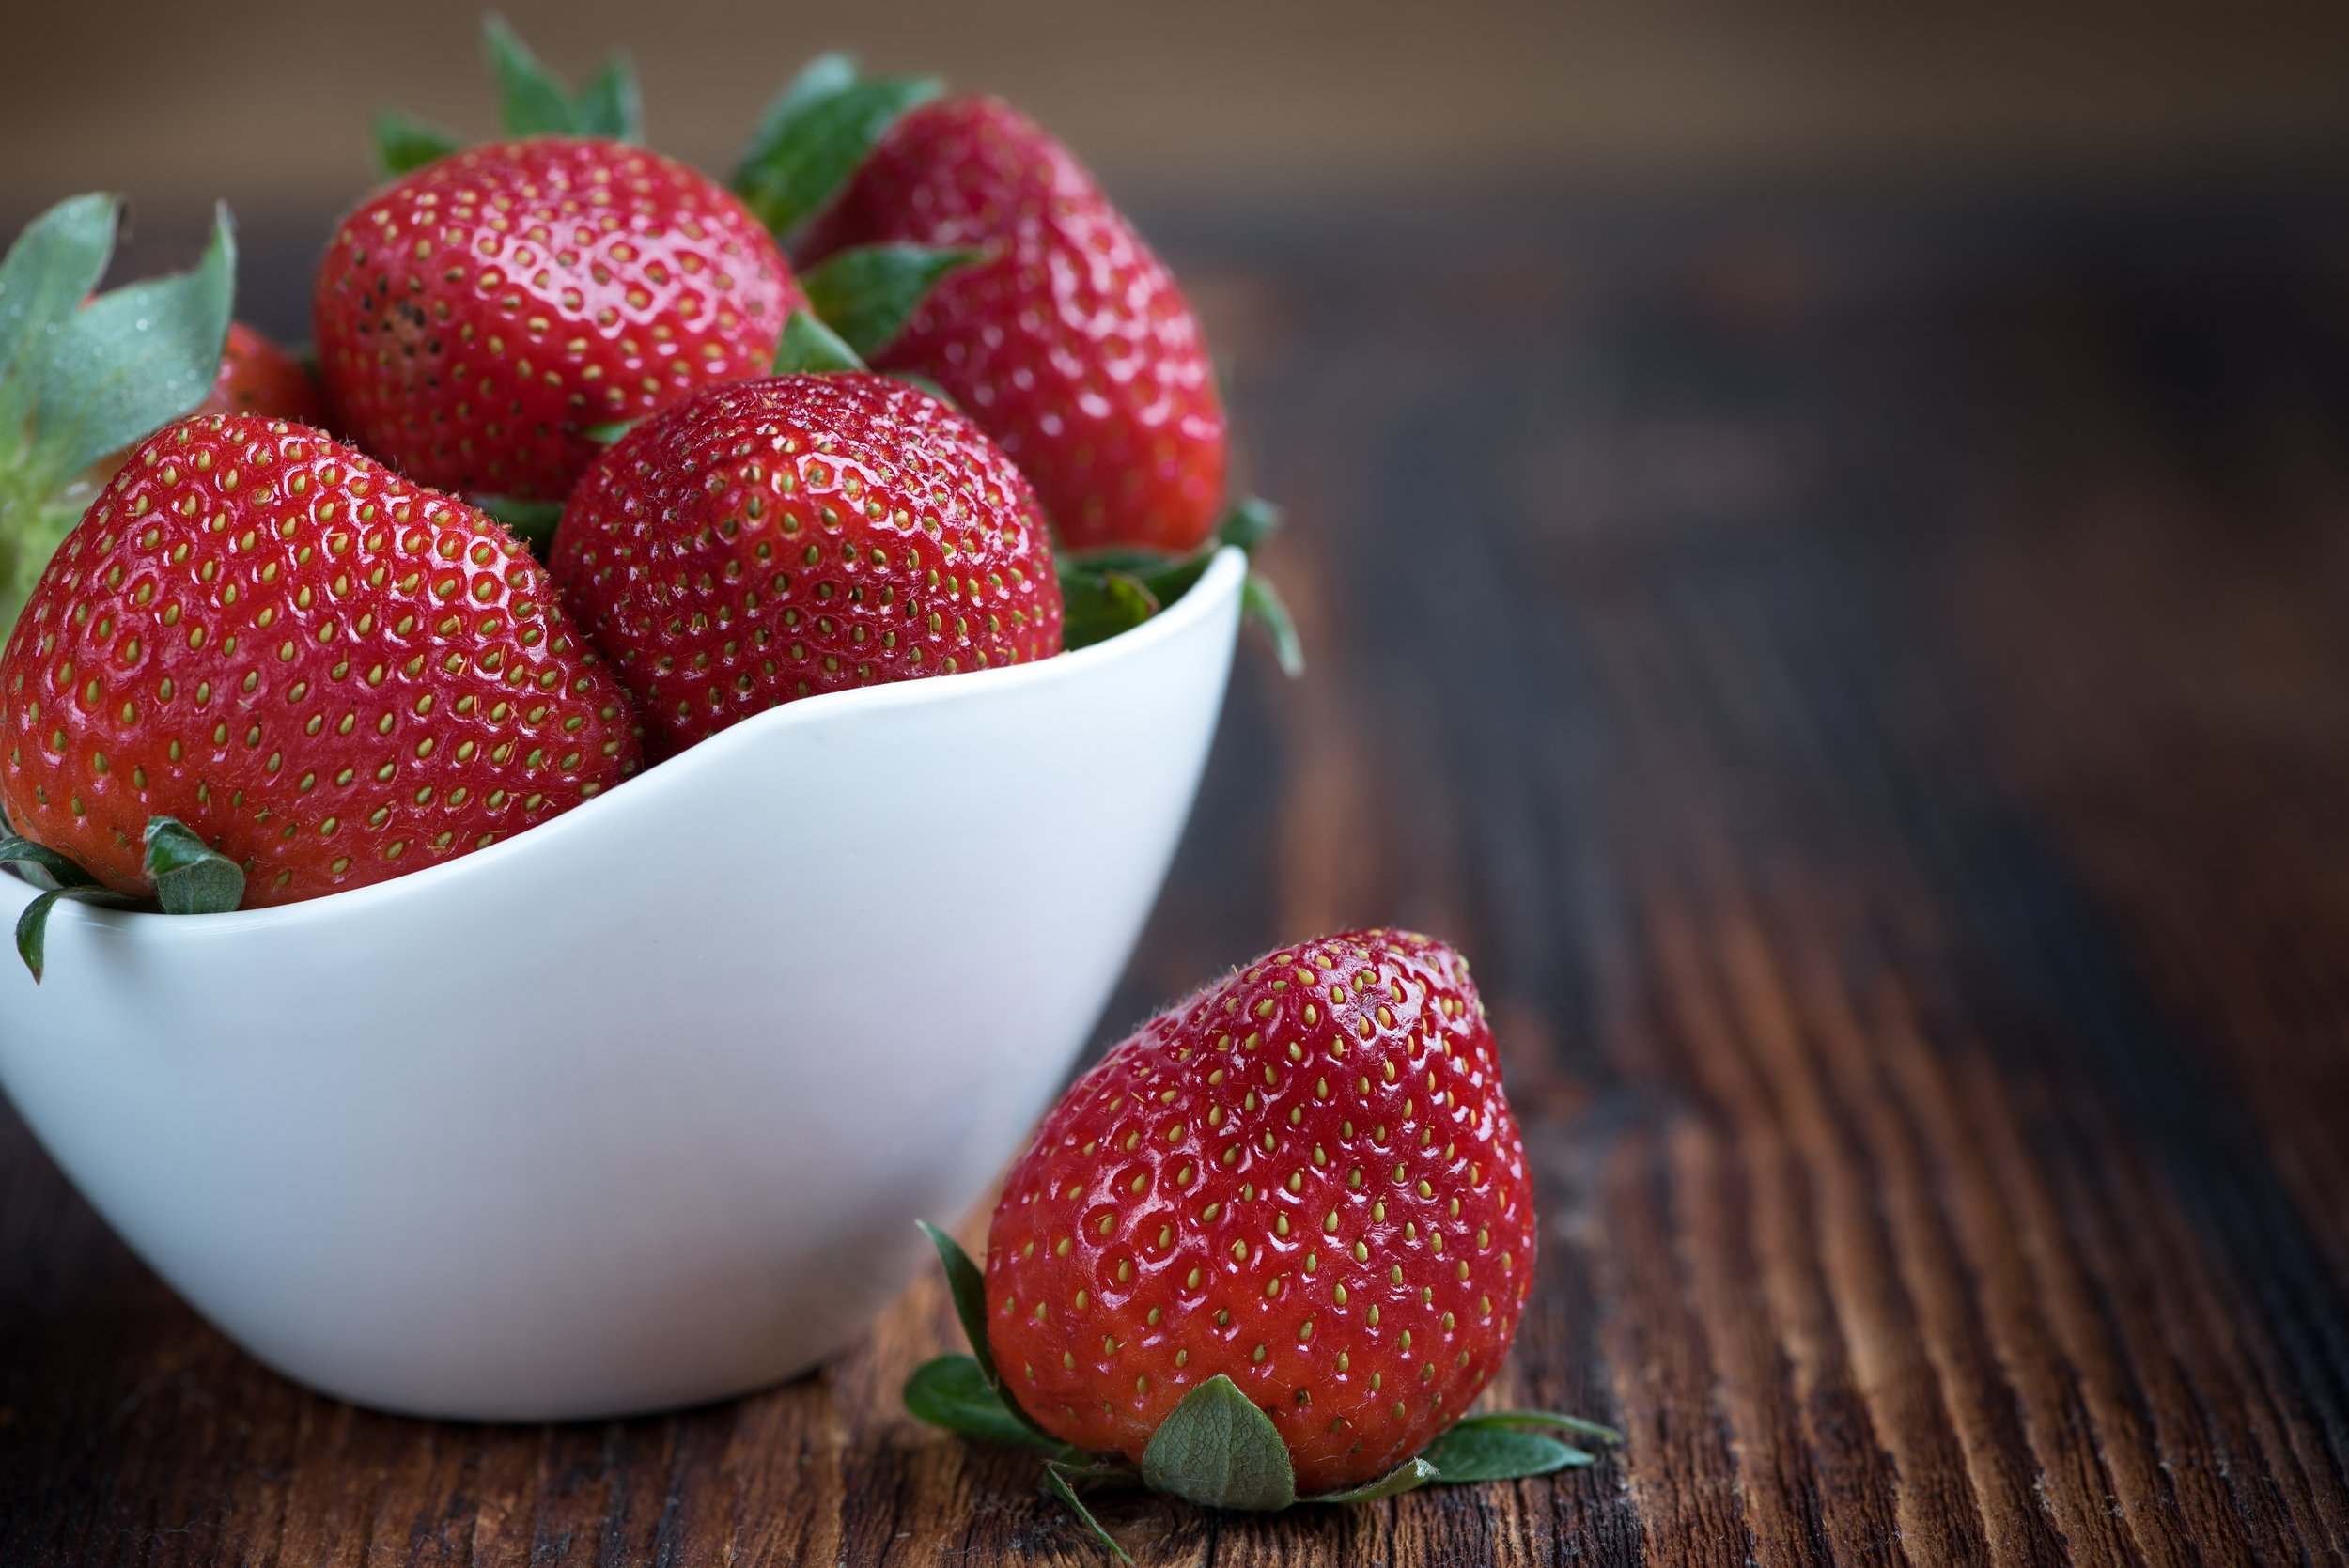 strawberries-frisch-ripe-sweet-89778.jpeg